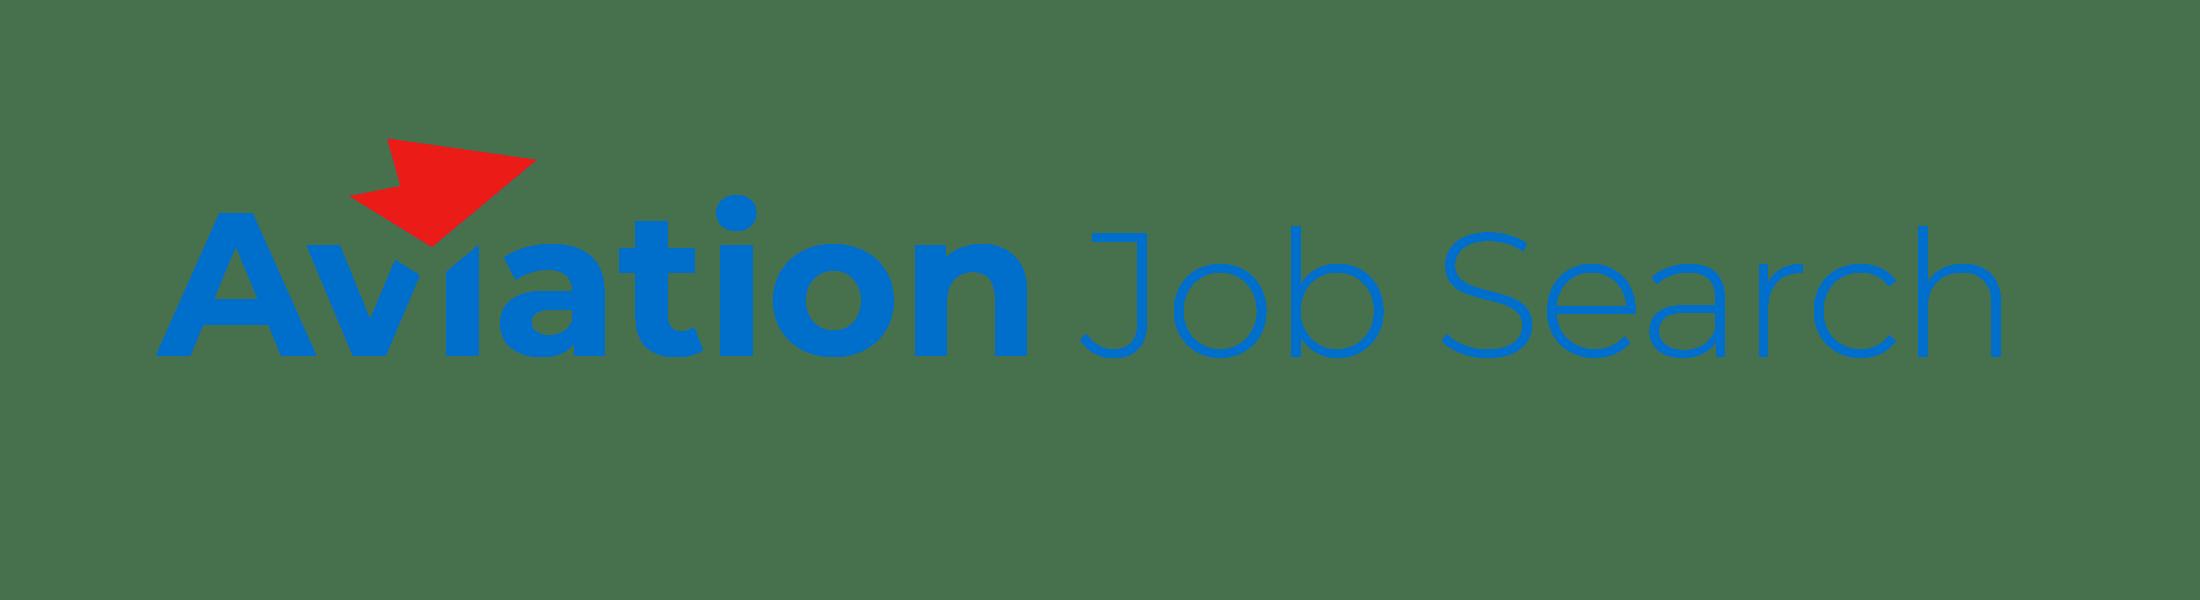 Aviation Job Search